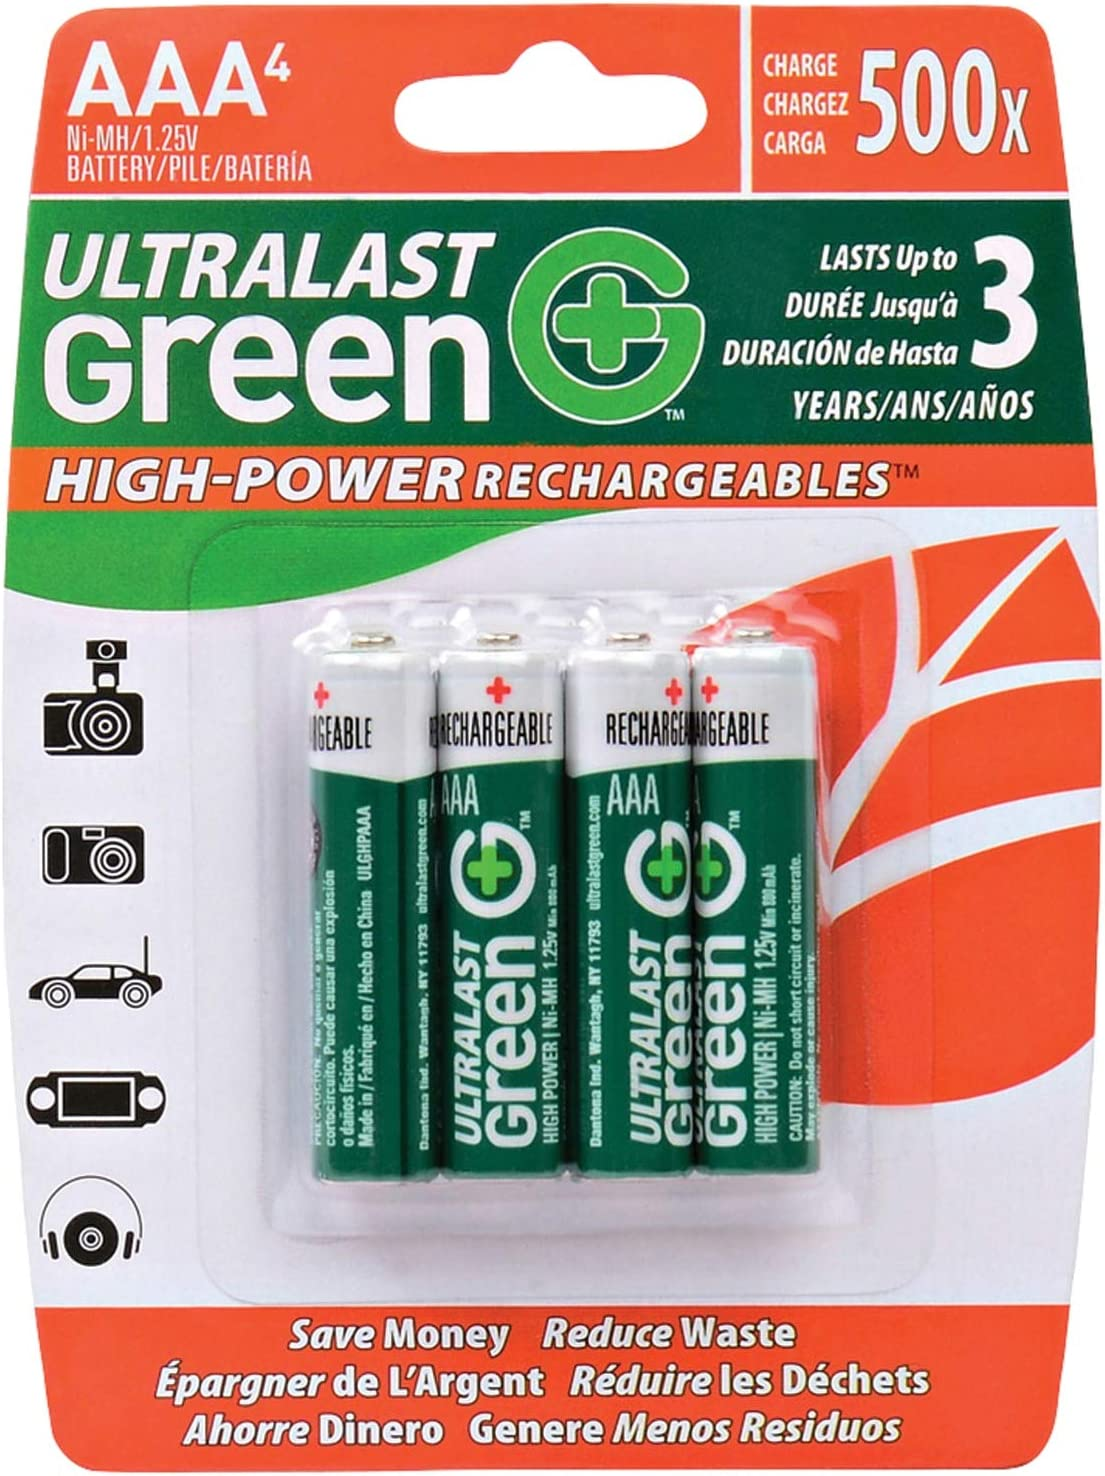 Ultralast ULGHP4AAA Max 56% OFF AAA Green Battery Rechargeable High-Power Popular standard -